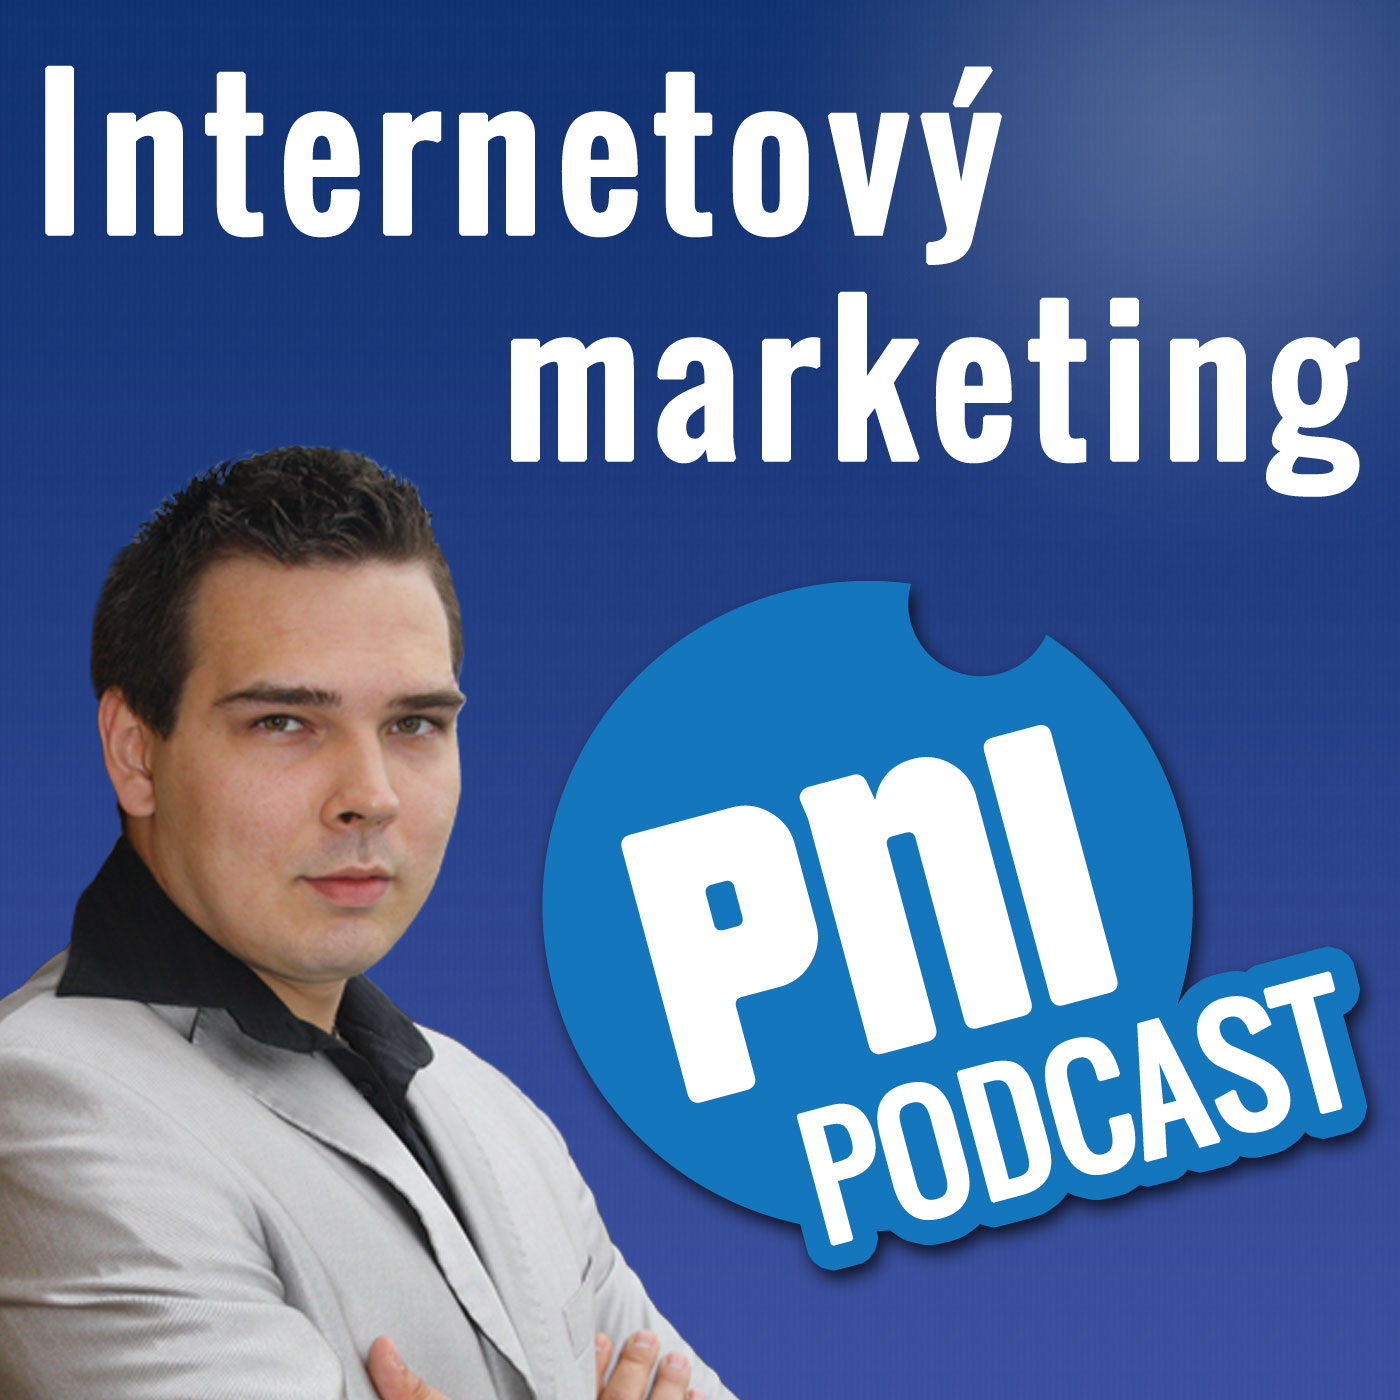 Propagace Na Internetu Podcast - SEO, Internetový Marketing, Email Marketing, Copywriting